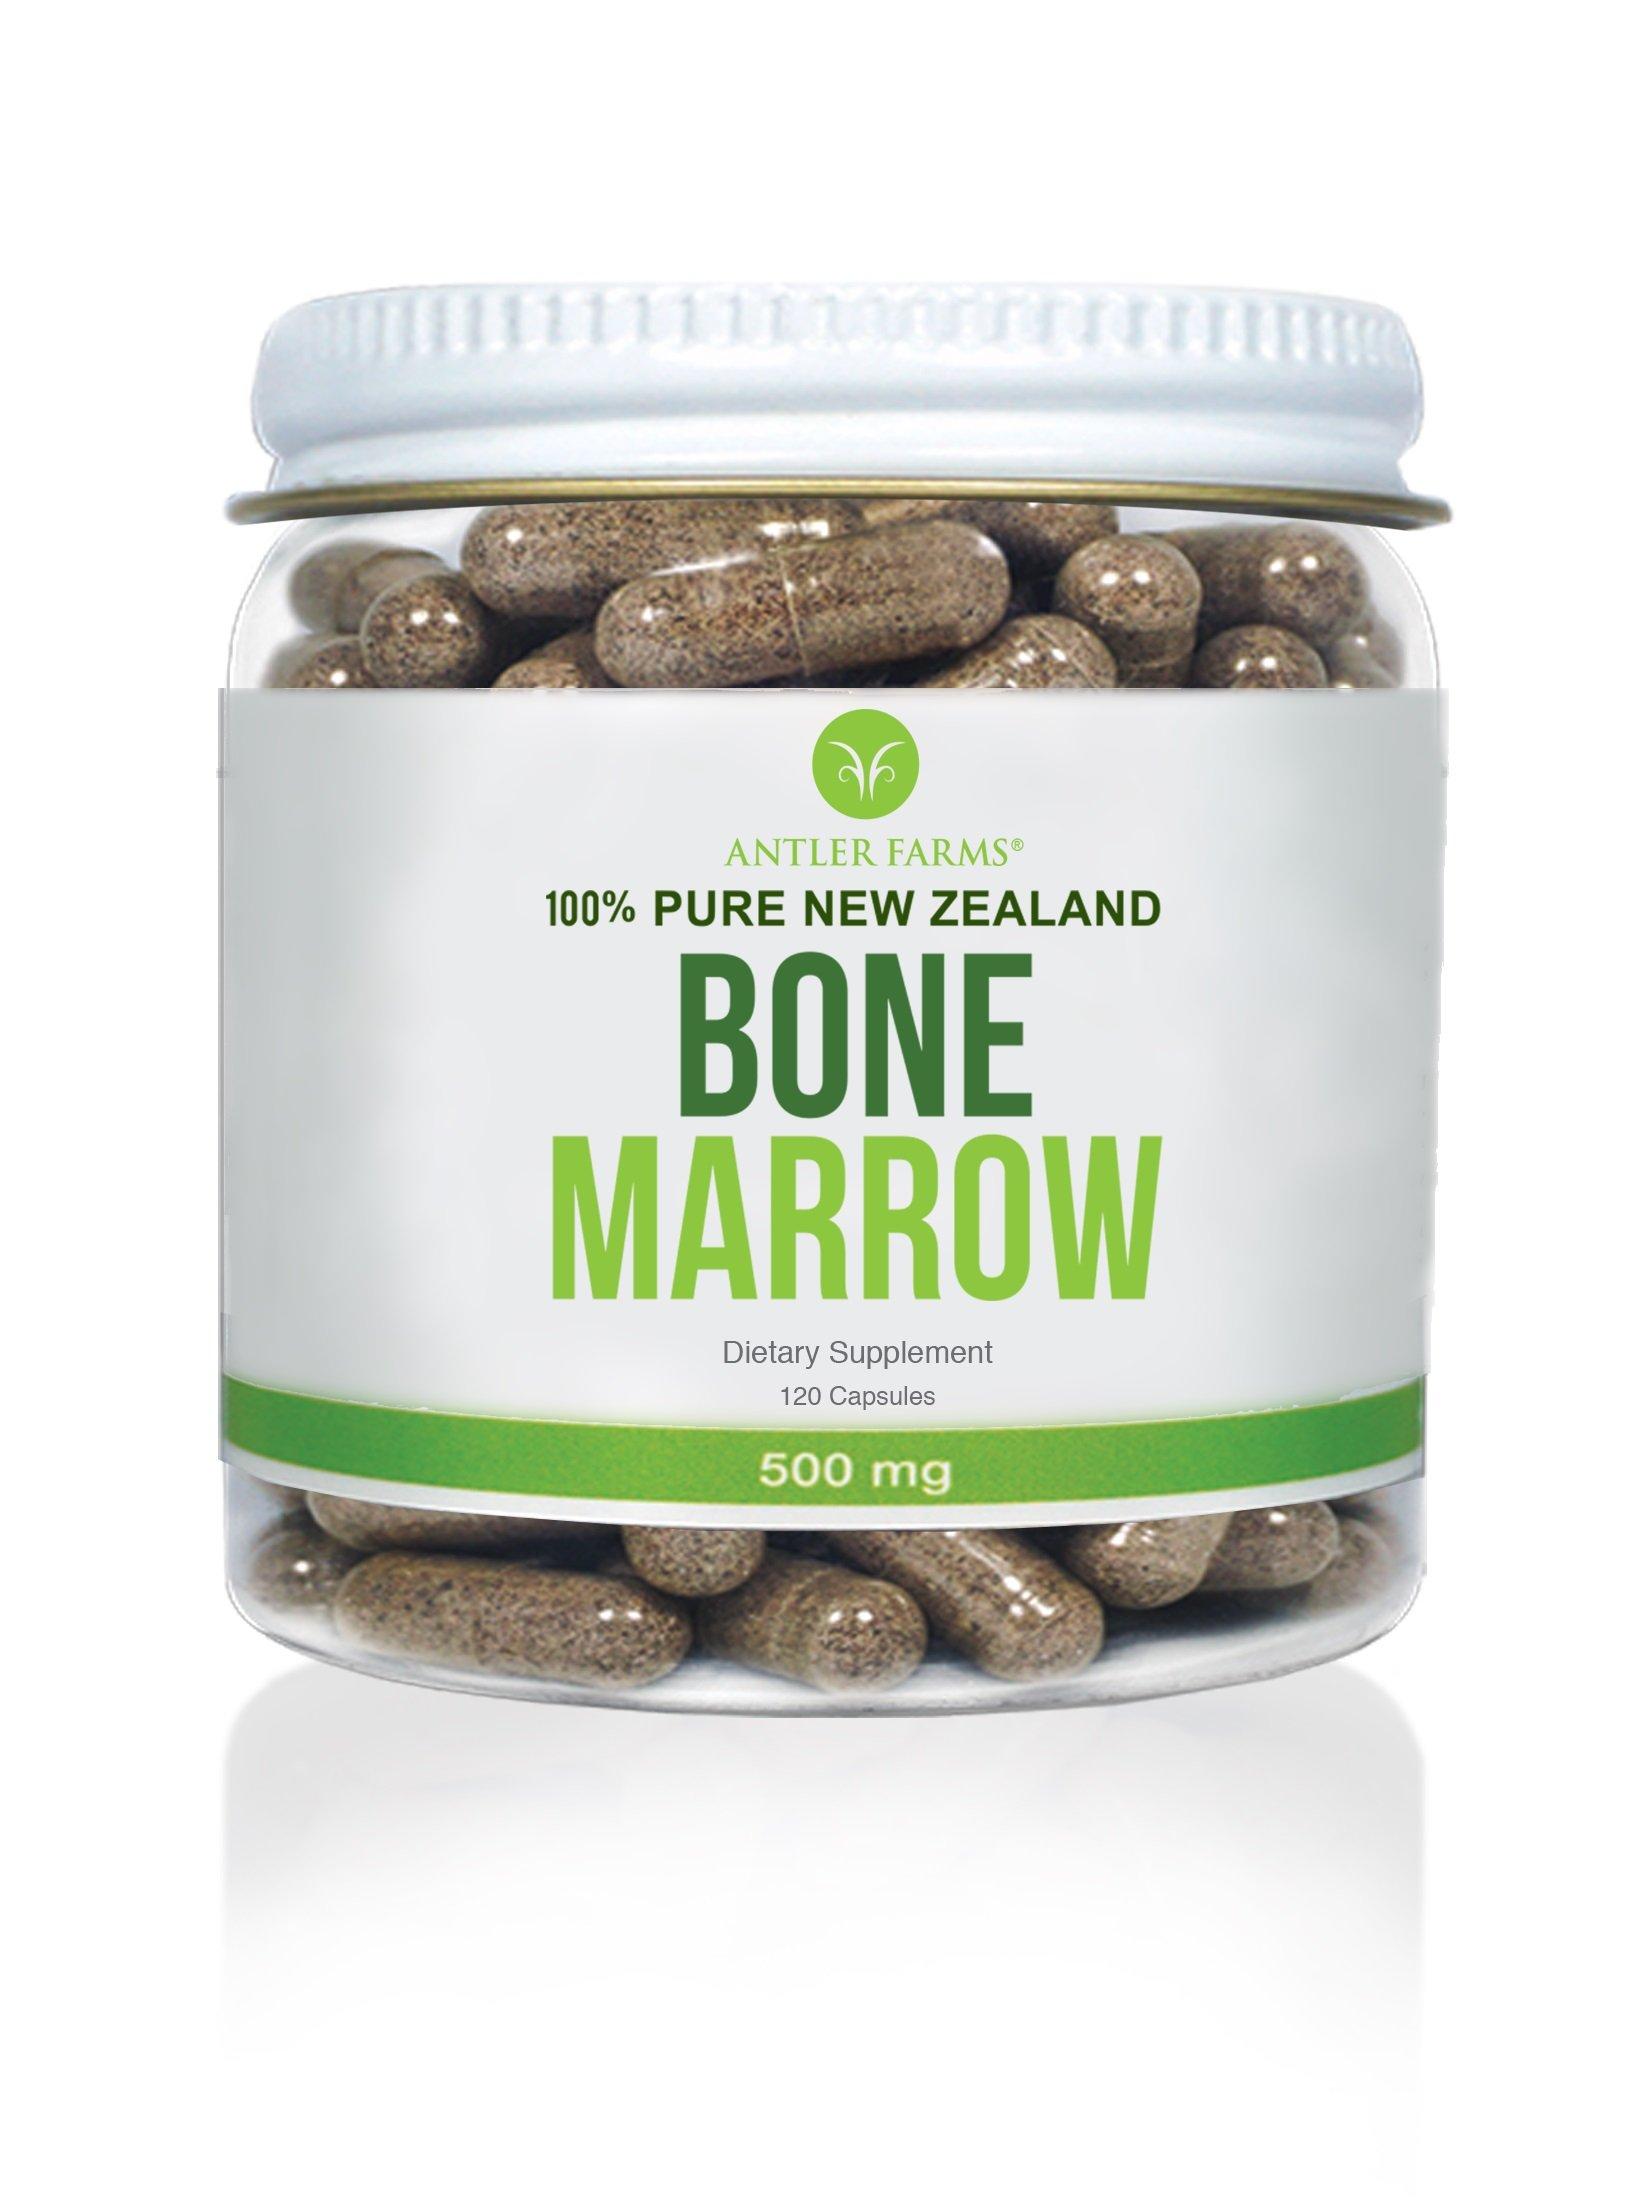 Antler Farms - 100% Pure New Zealand Bone